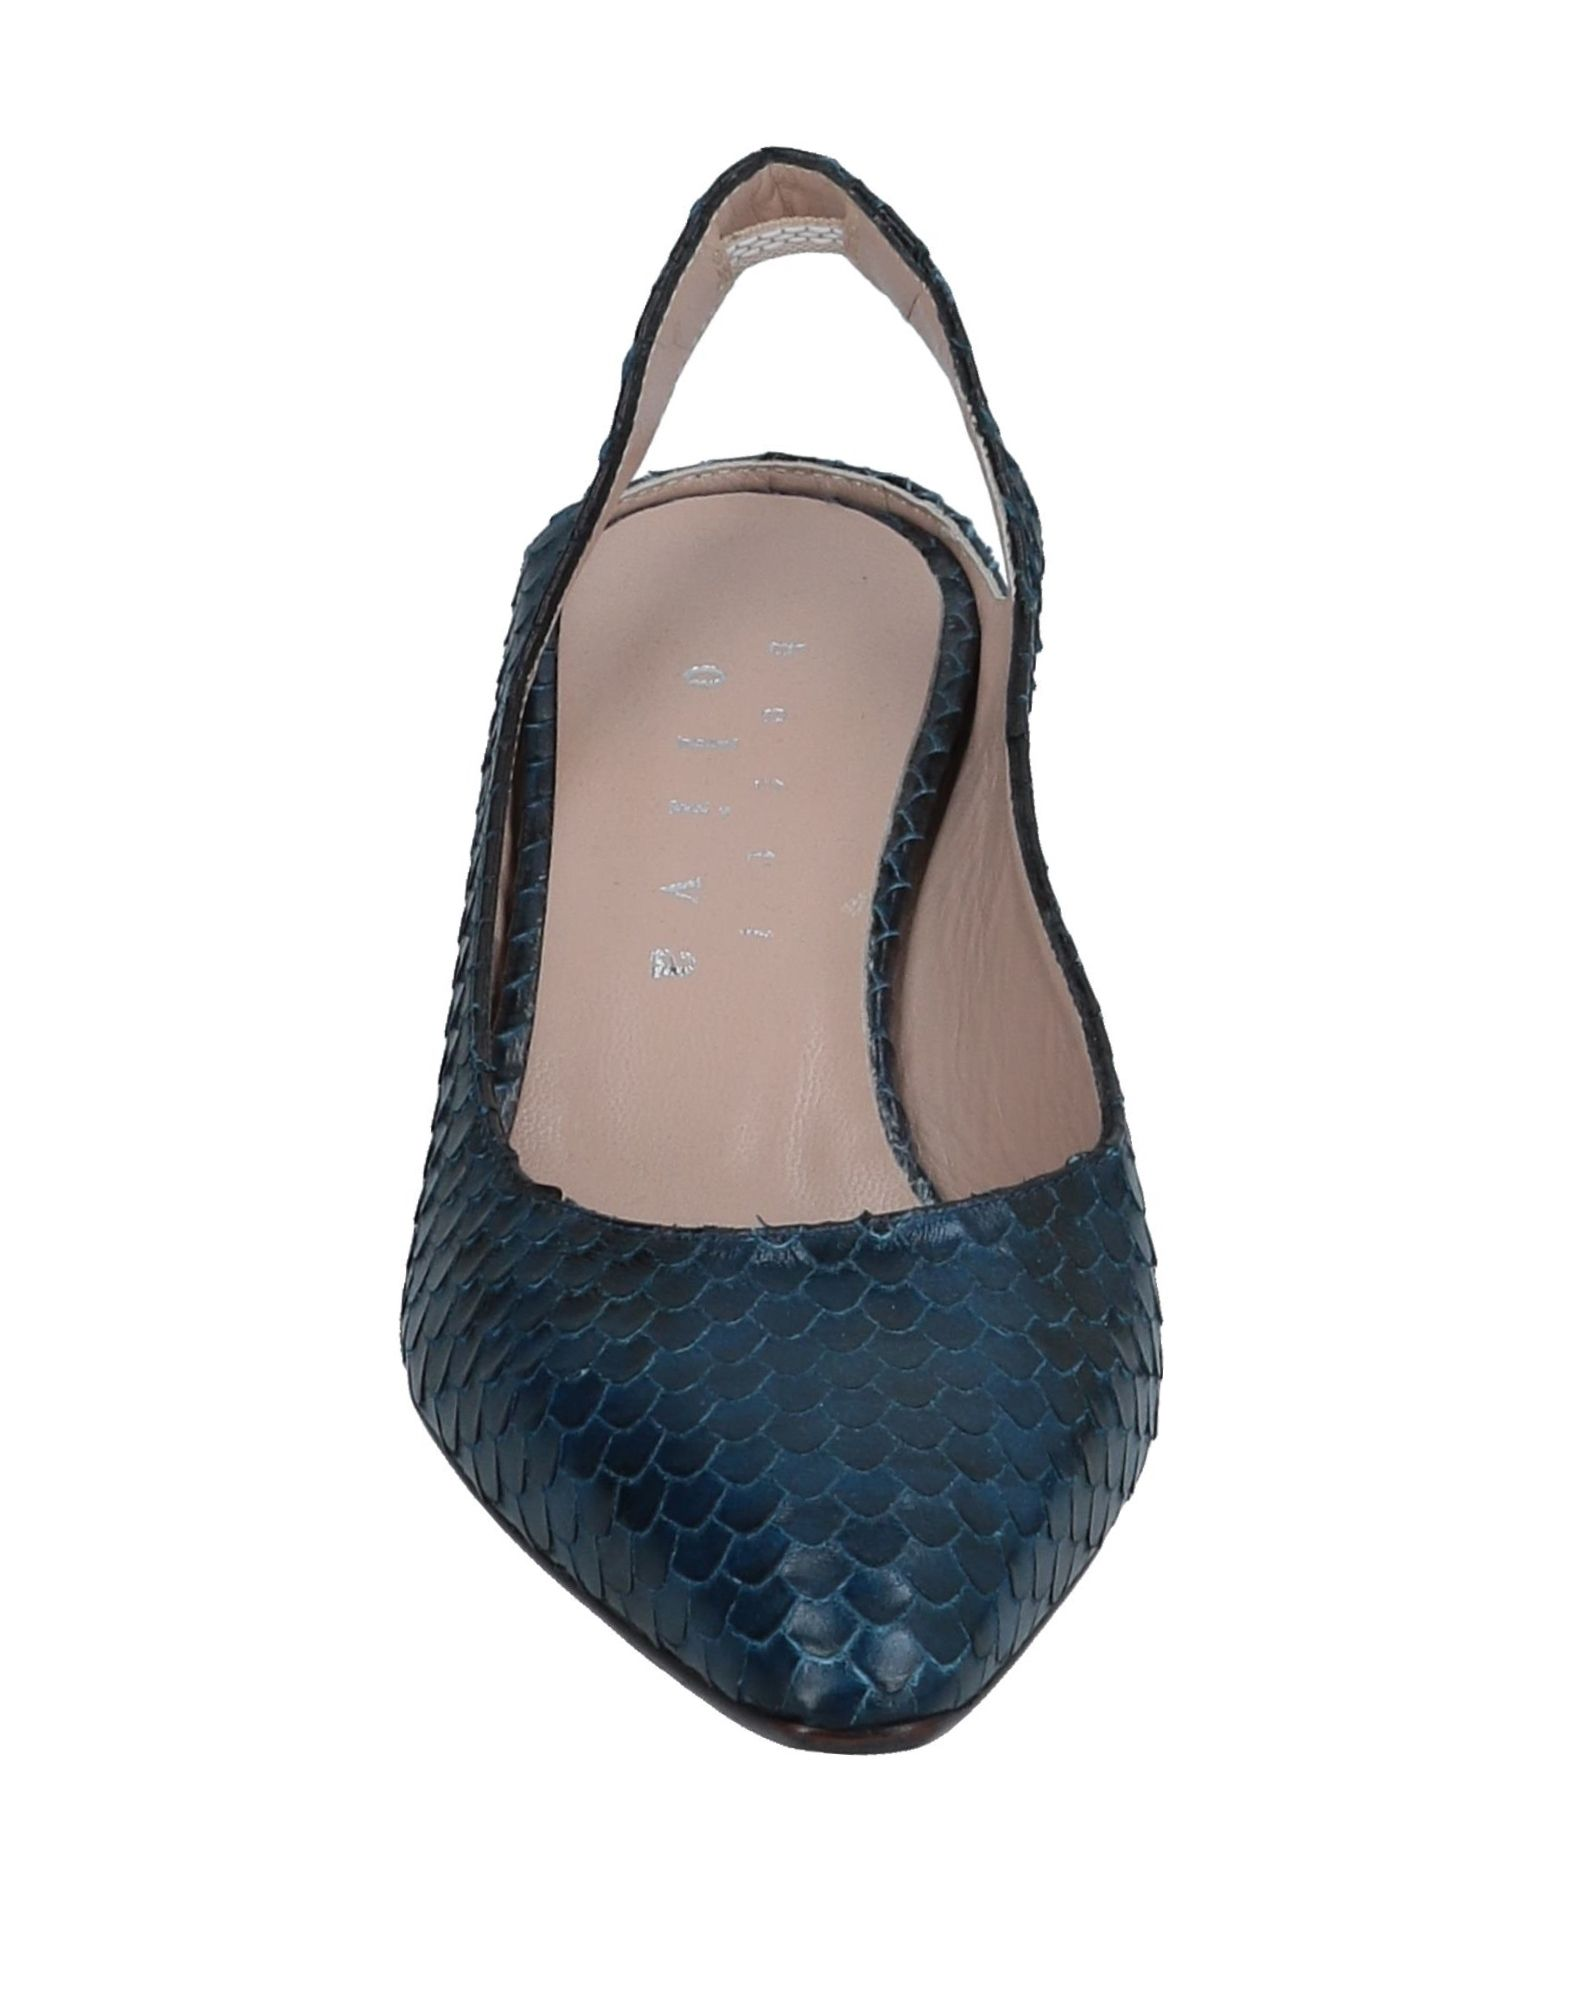 Betti 11558916EV Oliva Pumps Damen  11558916EV Betti Gute Qualität beliebte Schuhe 7de6a3